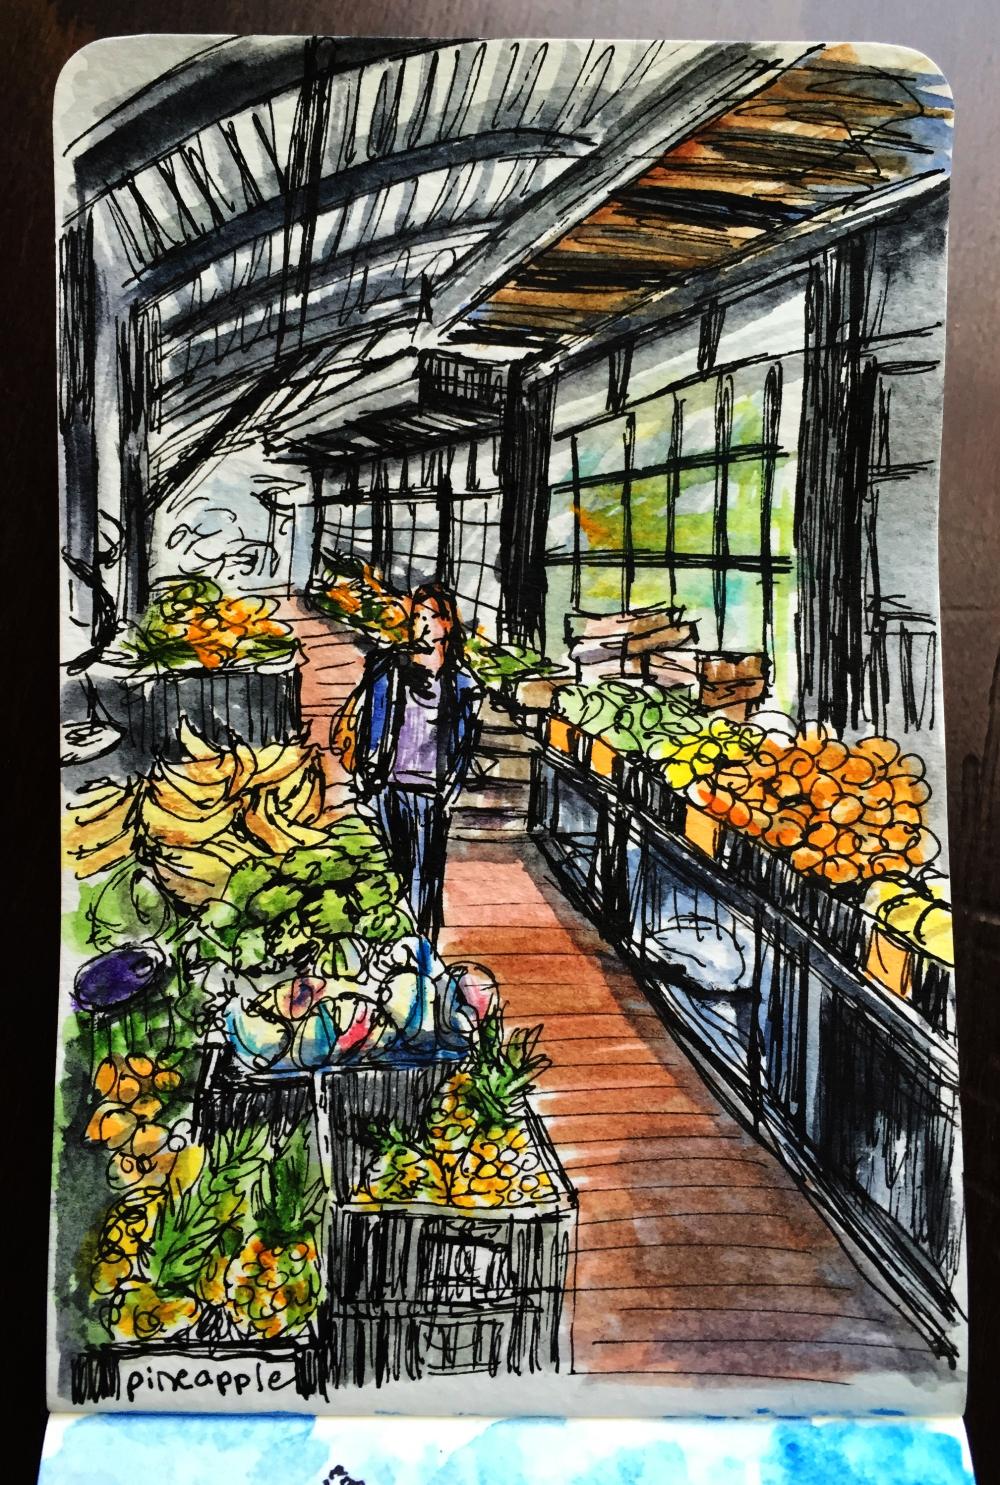 City Market by Charlie O'Shields